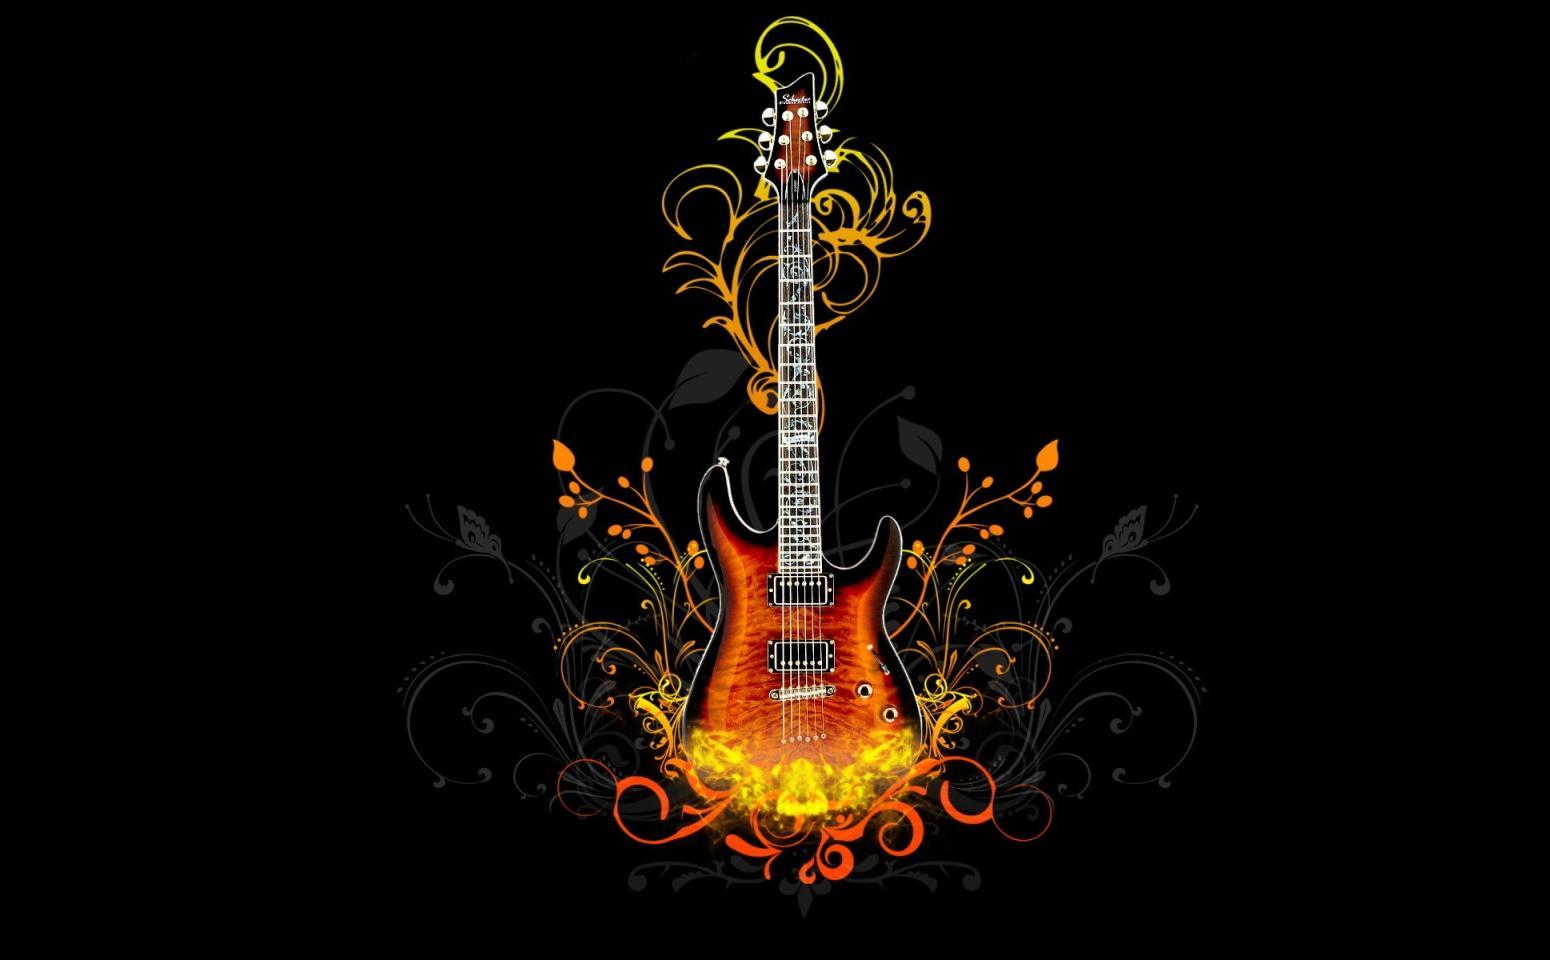 http://4.bp.blogspot.com/-uZEkcKlFQg4/TjnimayLIvI/AAAAAAAAASw/h4WCOaYK-Uk/s1600/Guitar_and_ribbons_1280x960+hd+wallpaper.JPG